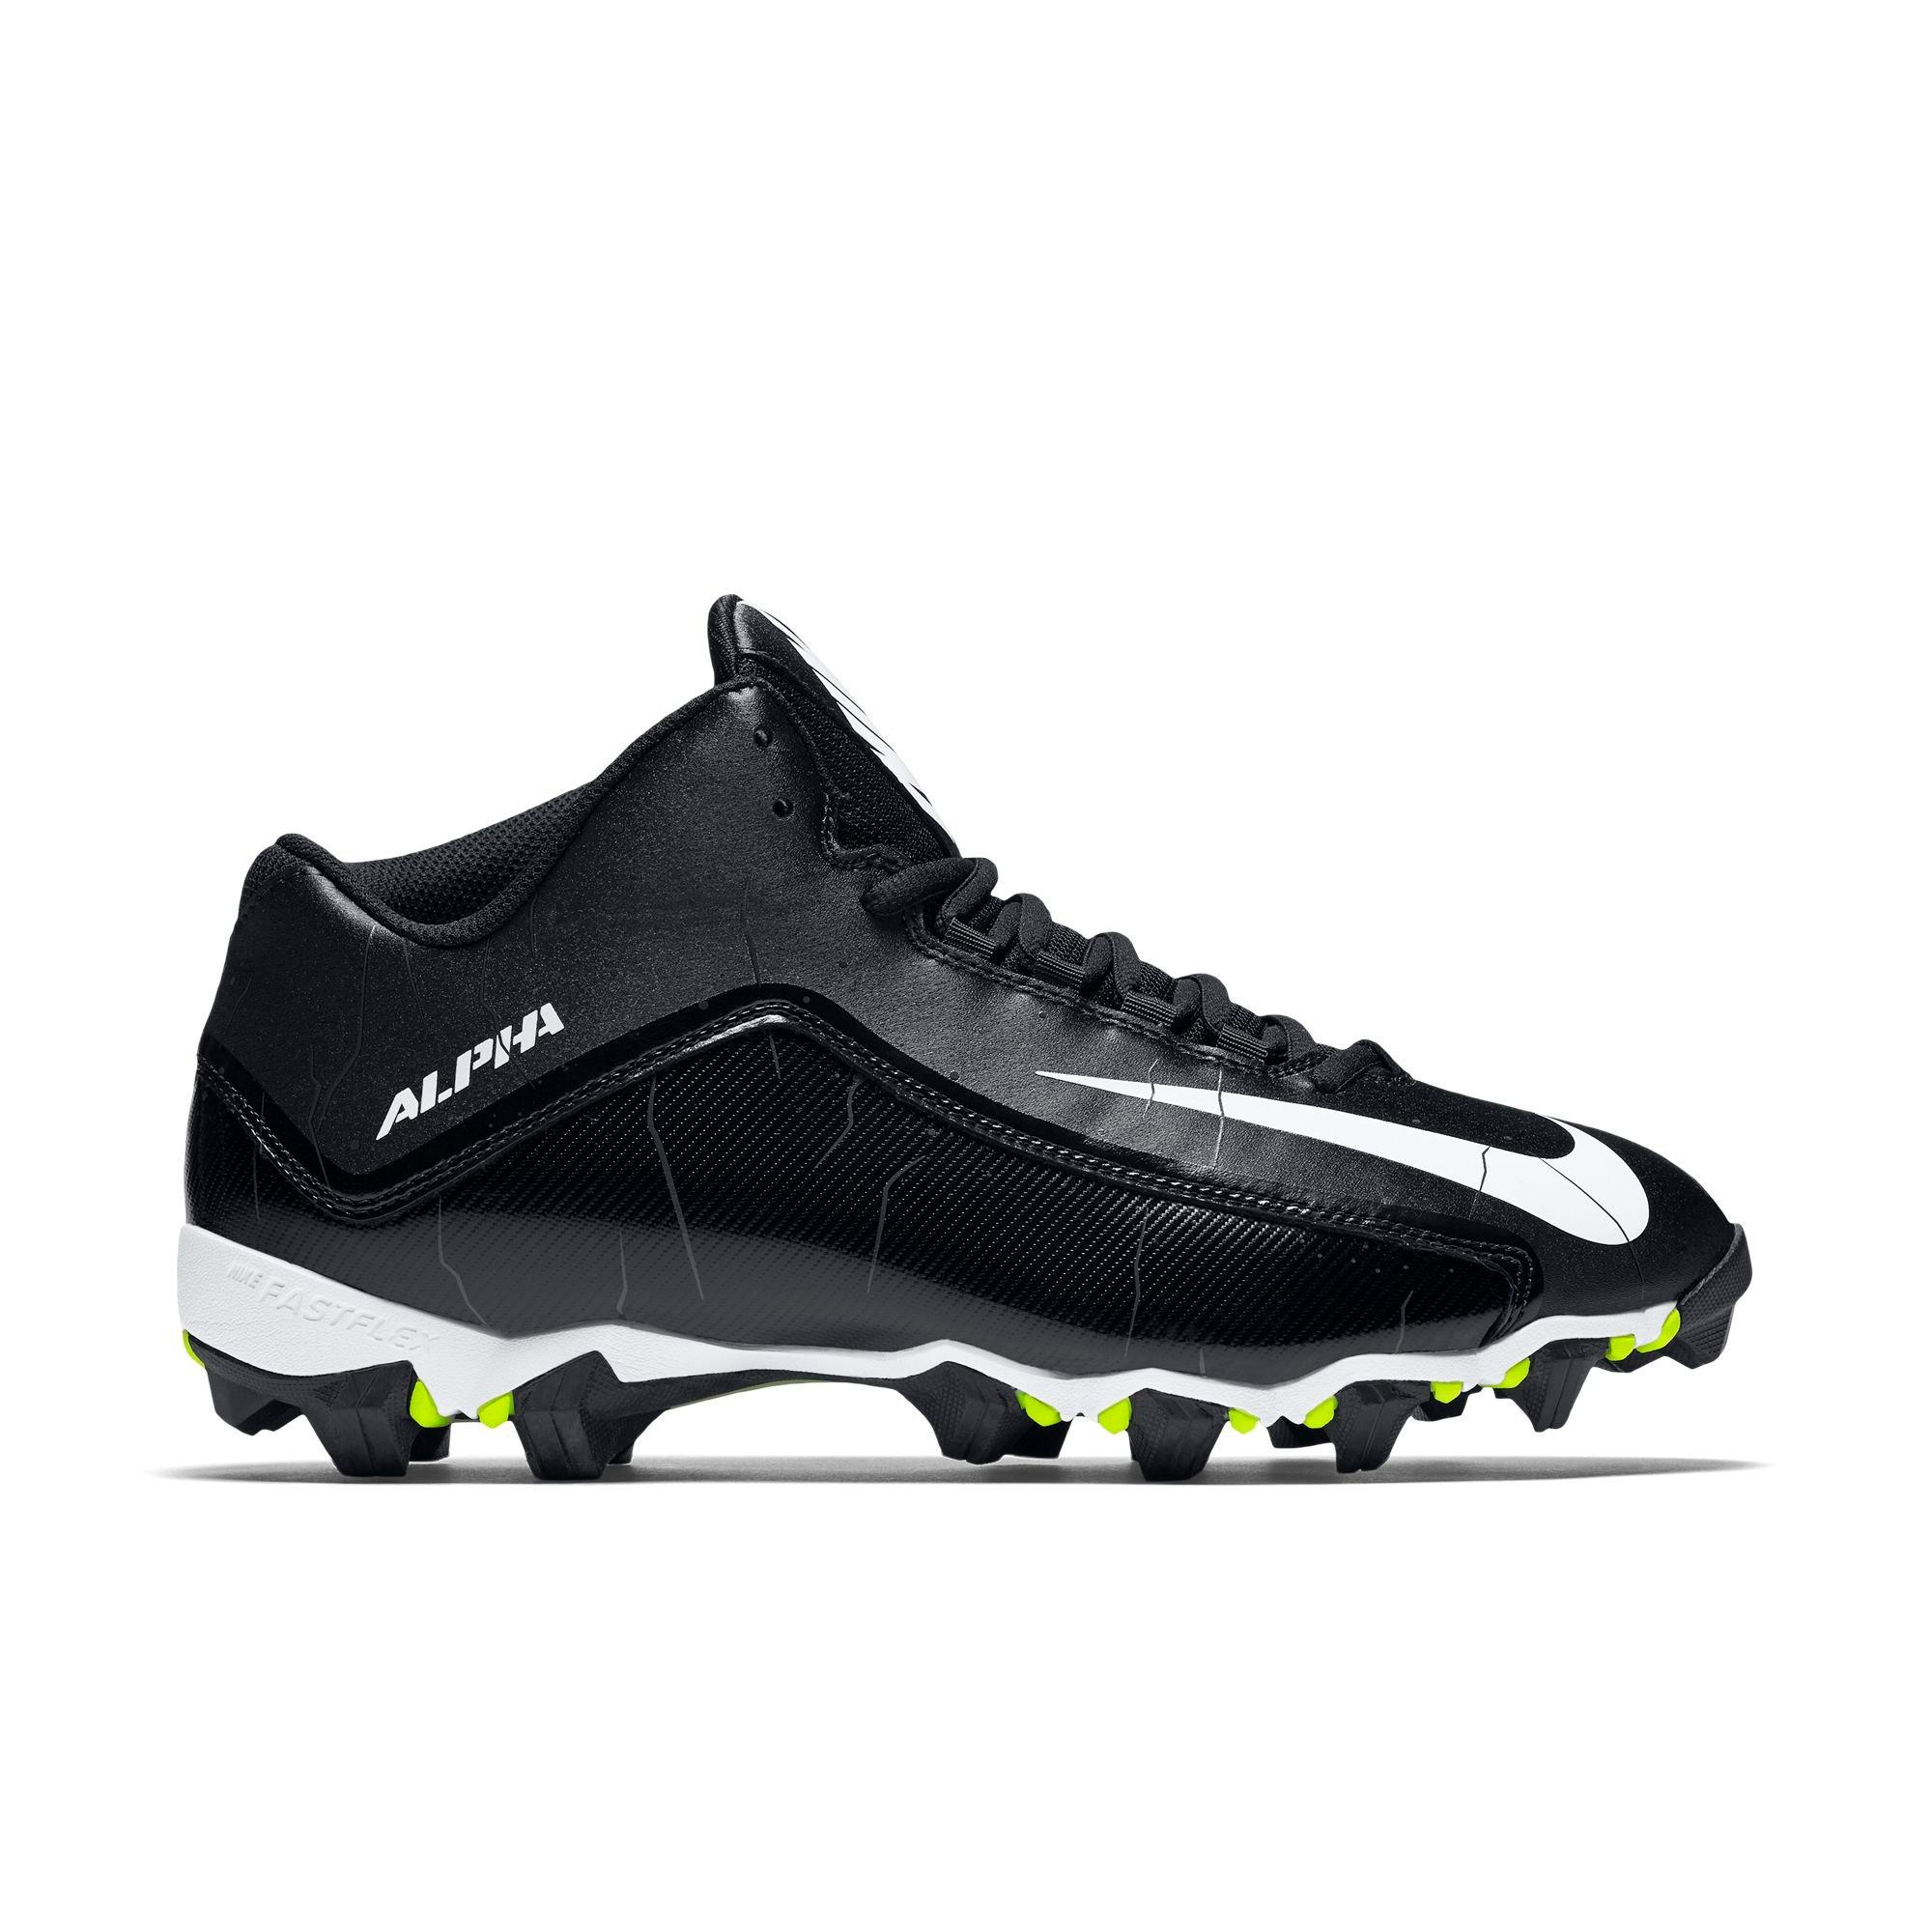 Nike Alpha Shark 2 Wide 3/4 Men\u0027s Football Cleats - Main Container Image 1